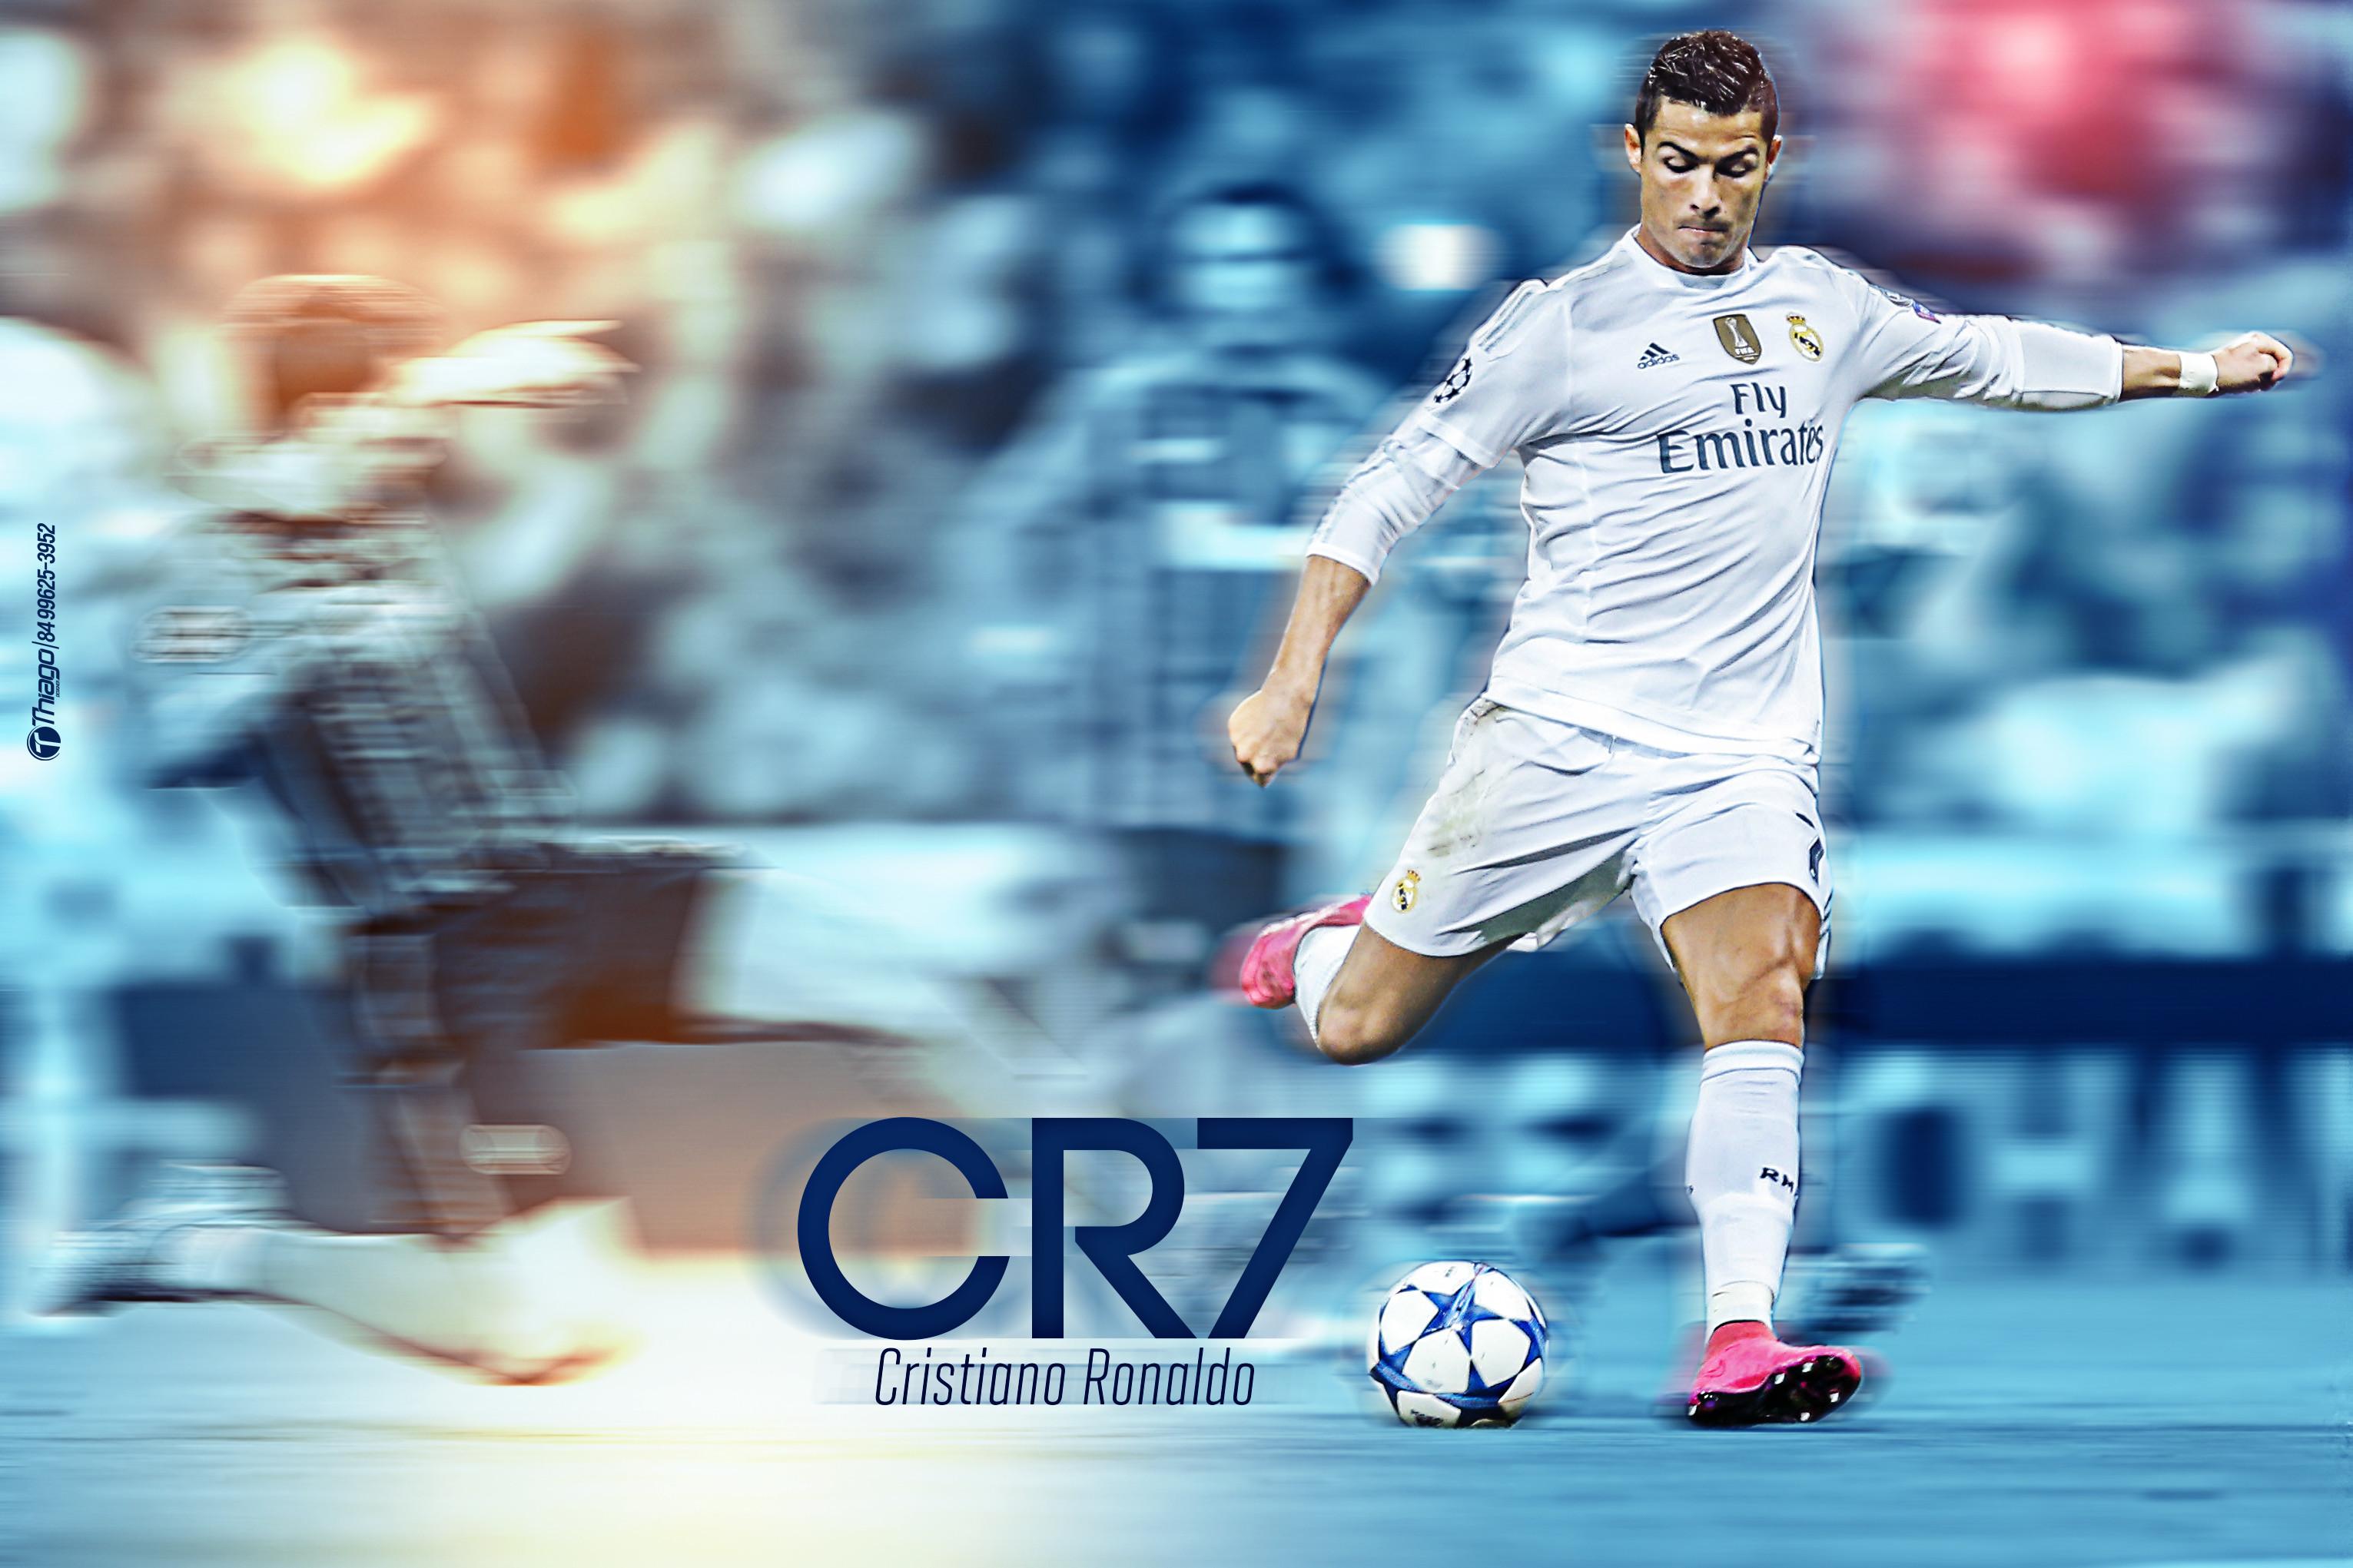 cristiano ronaldo pic full hd, Bishop Murphy 2017-03-04   sharovarka    Pinterest   Cristiano ronaldo and Ronaldo